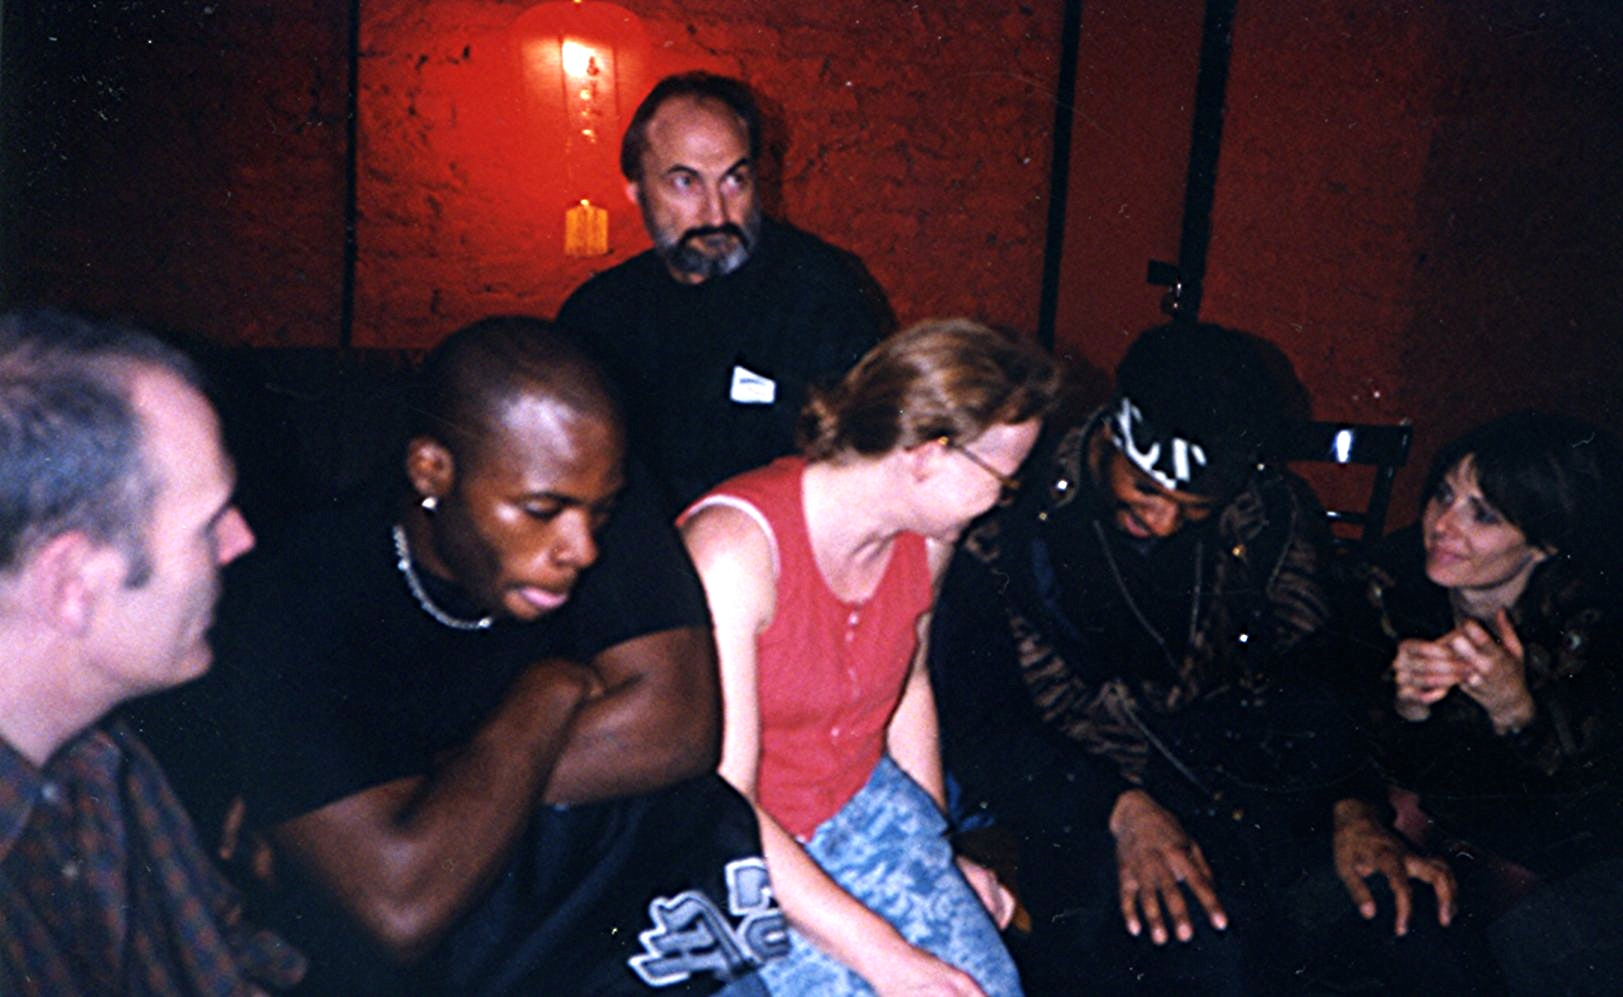 photo_hanging 1999007.jpg